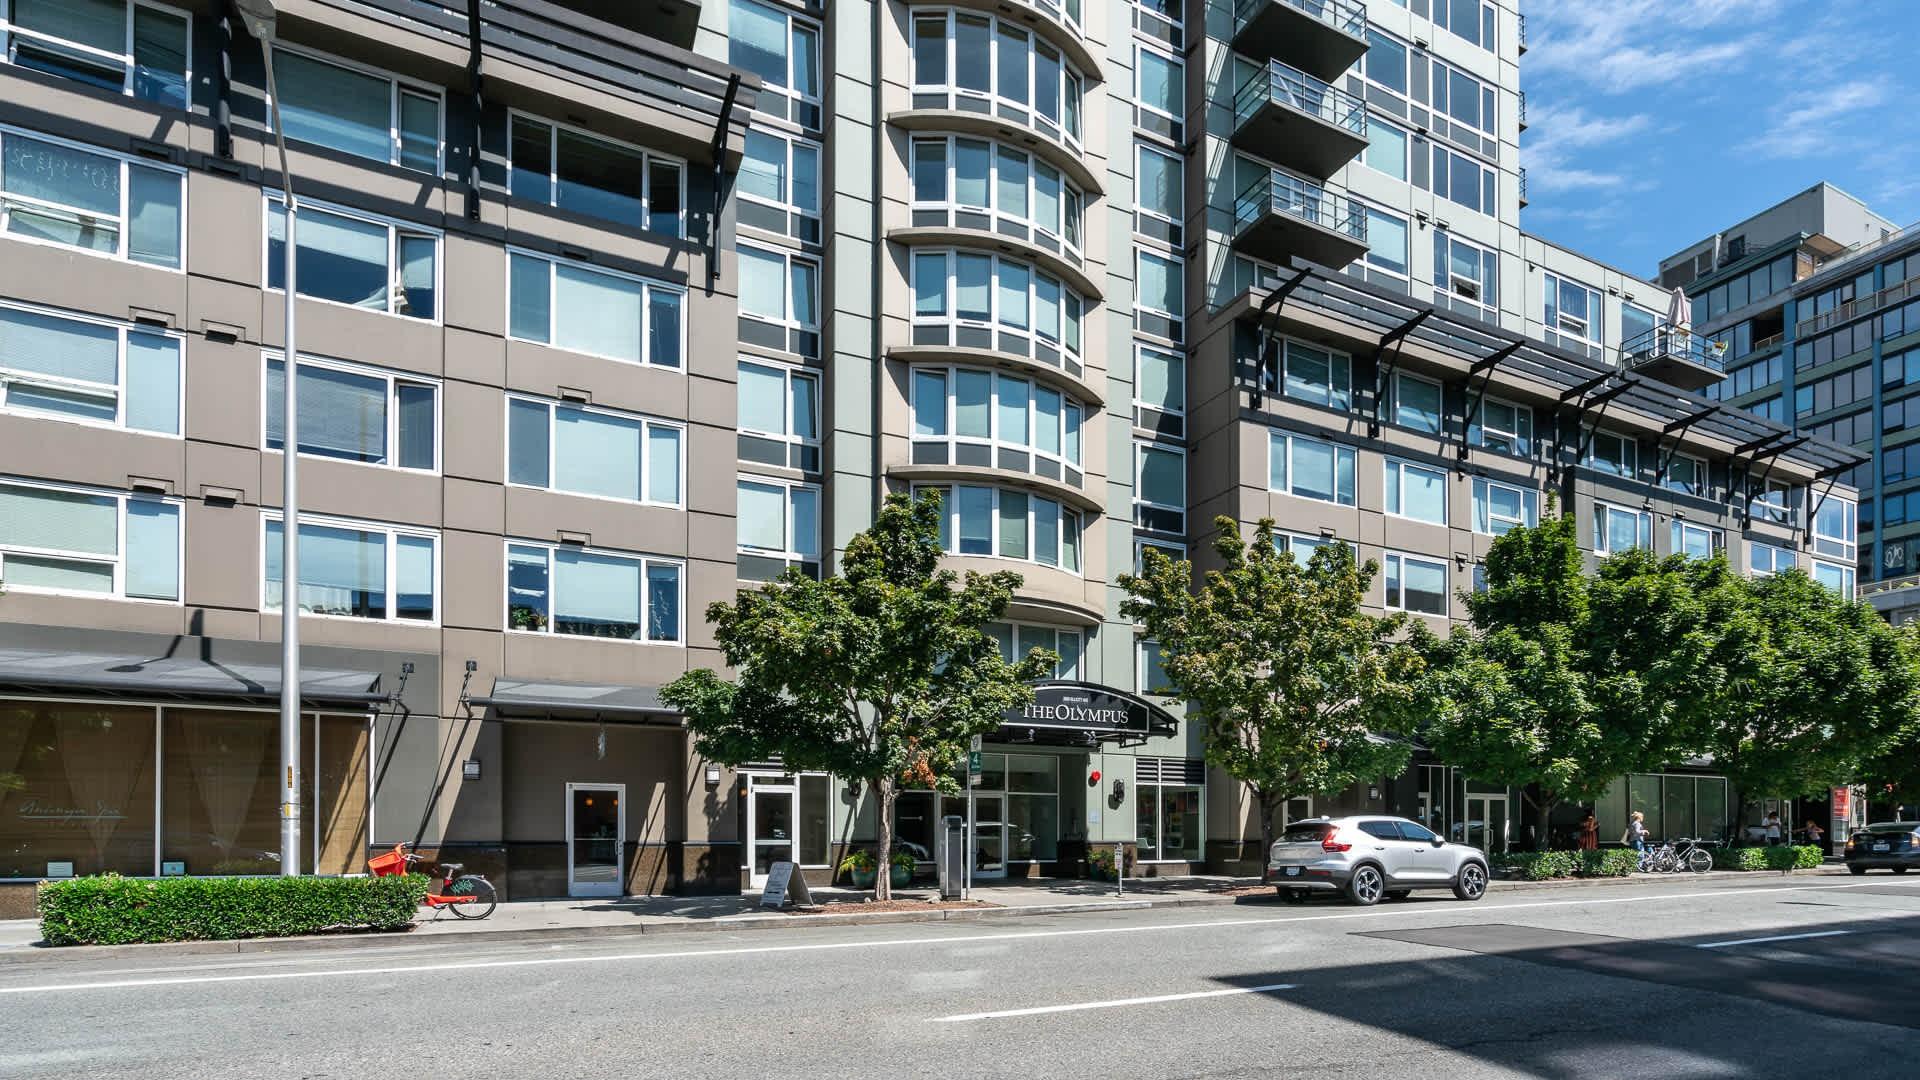 Apartments Near UW Olympus for University of Washington Students in Seattle, WA